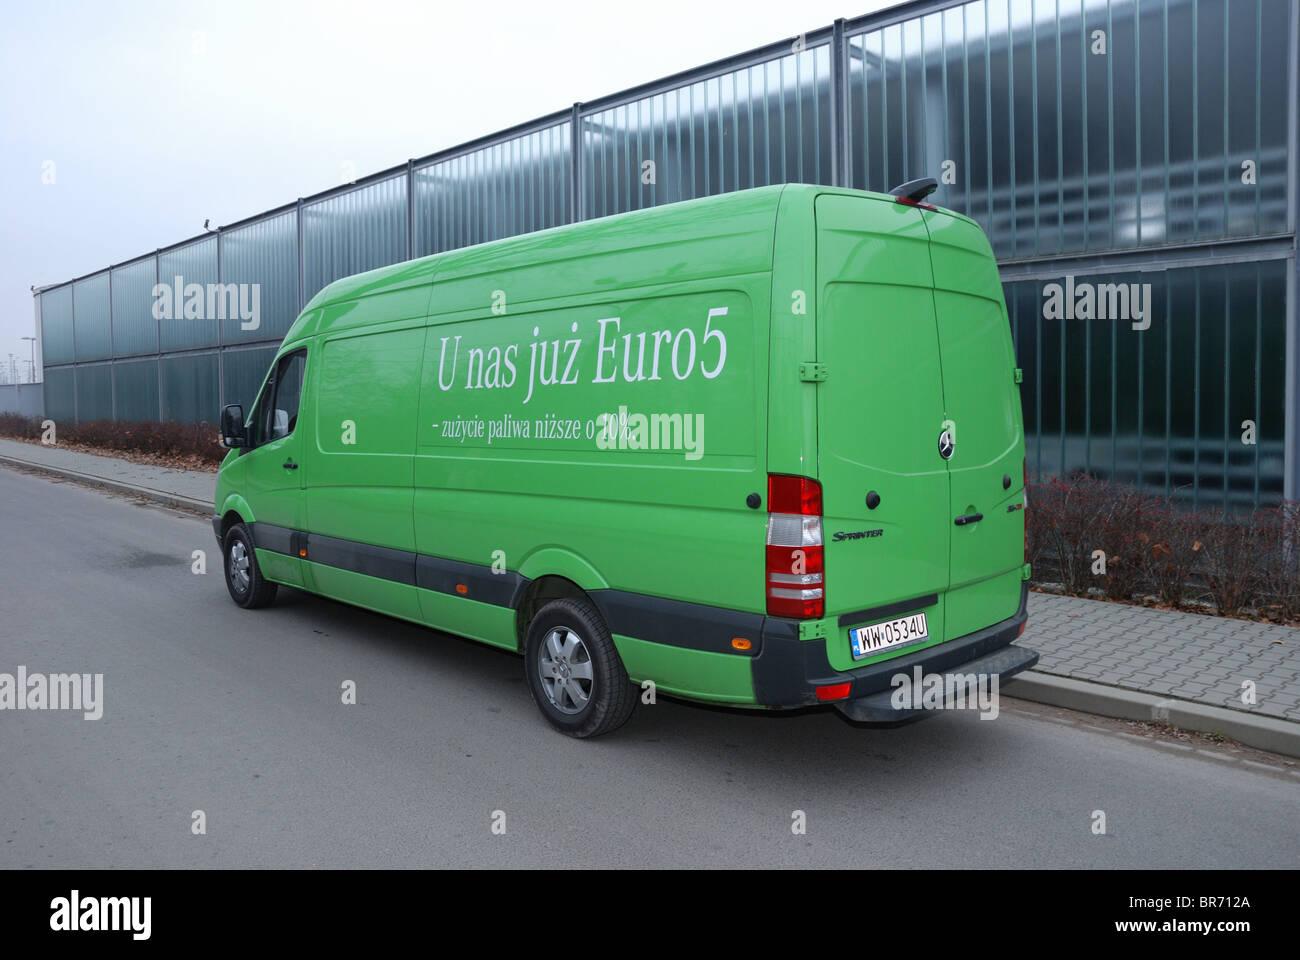 Mercedes benz sprinter 260 cdi van green l3h2 german mcv panel van city street